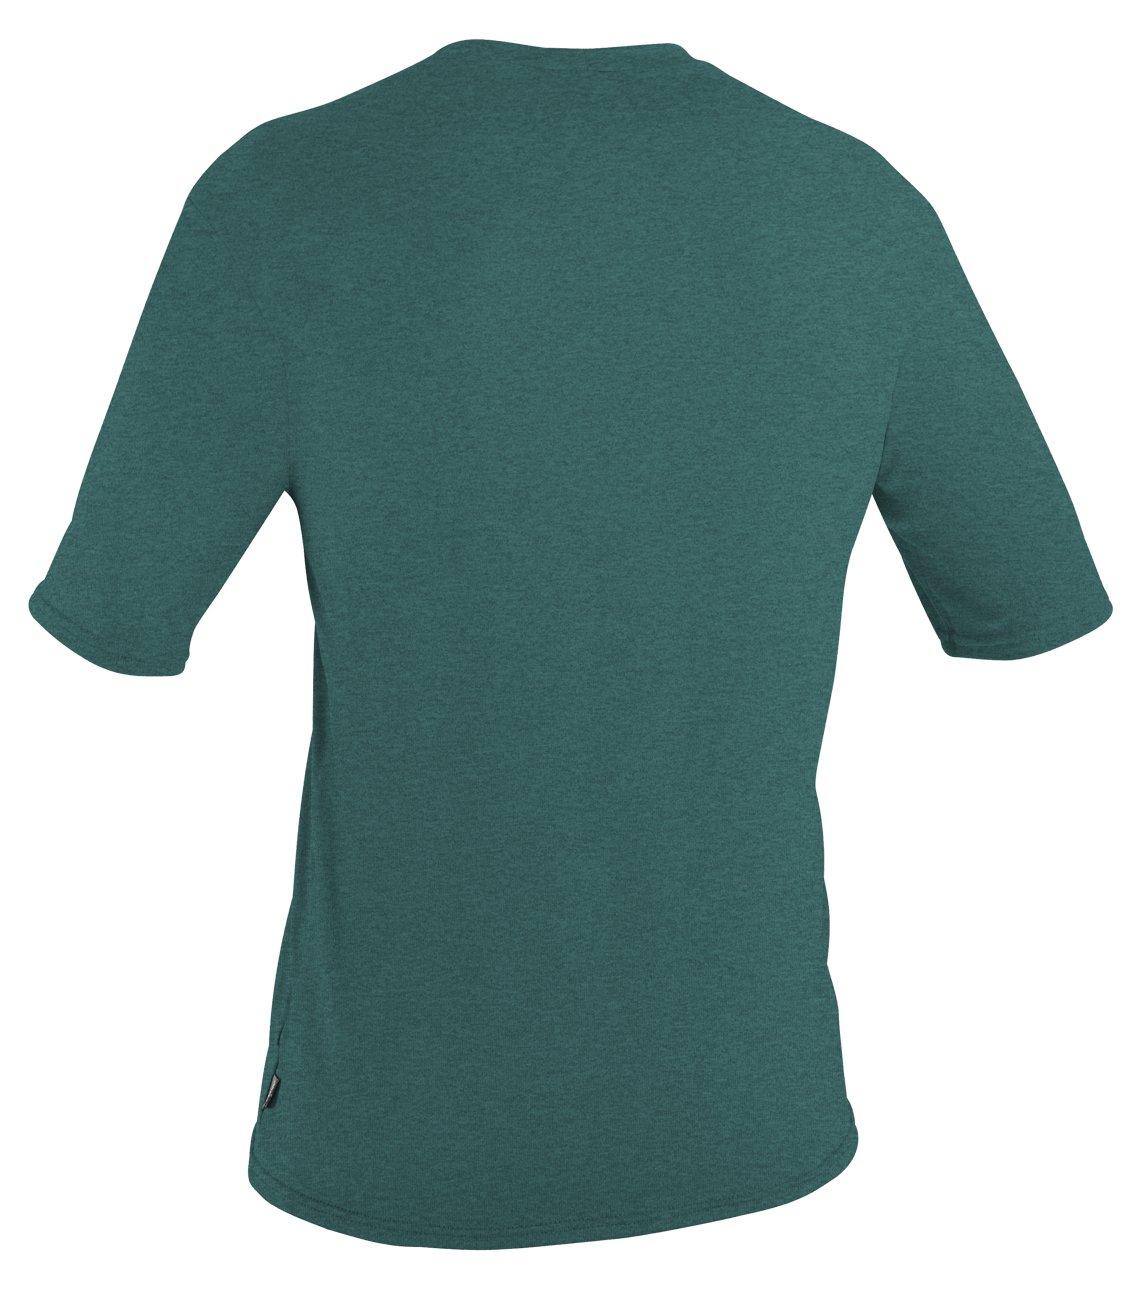 O'Neill Wetsuits Men's Hybrid UPF 50+ Short Sleeve Sun Shirt by O'Neill Wetsuits (Image #2)